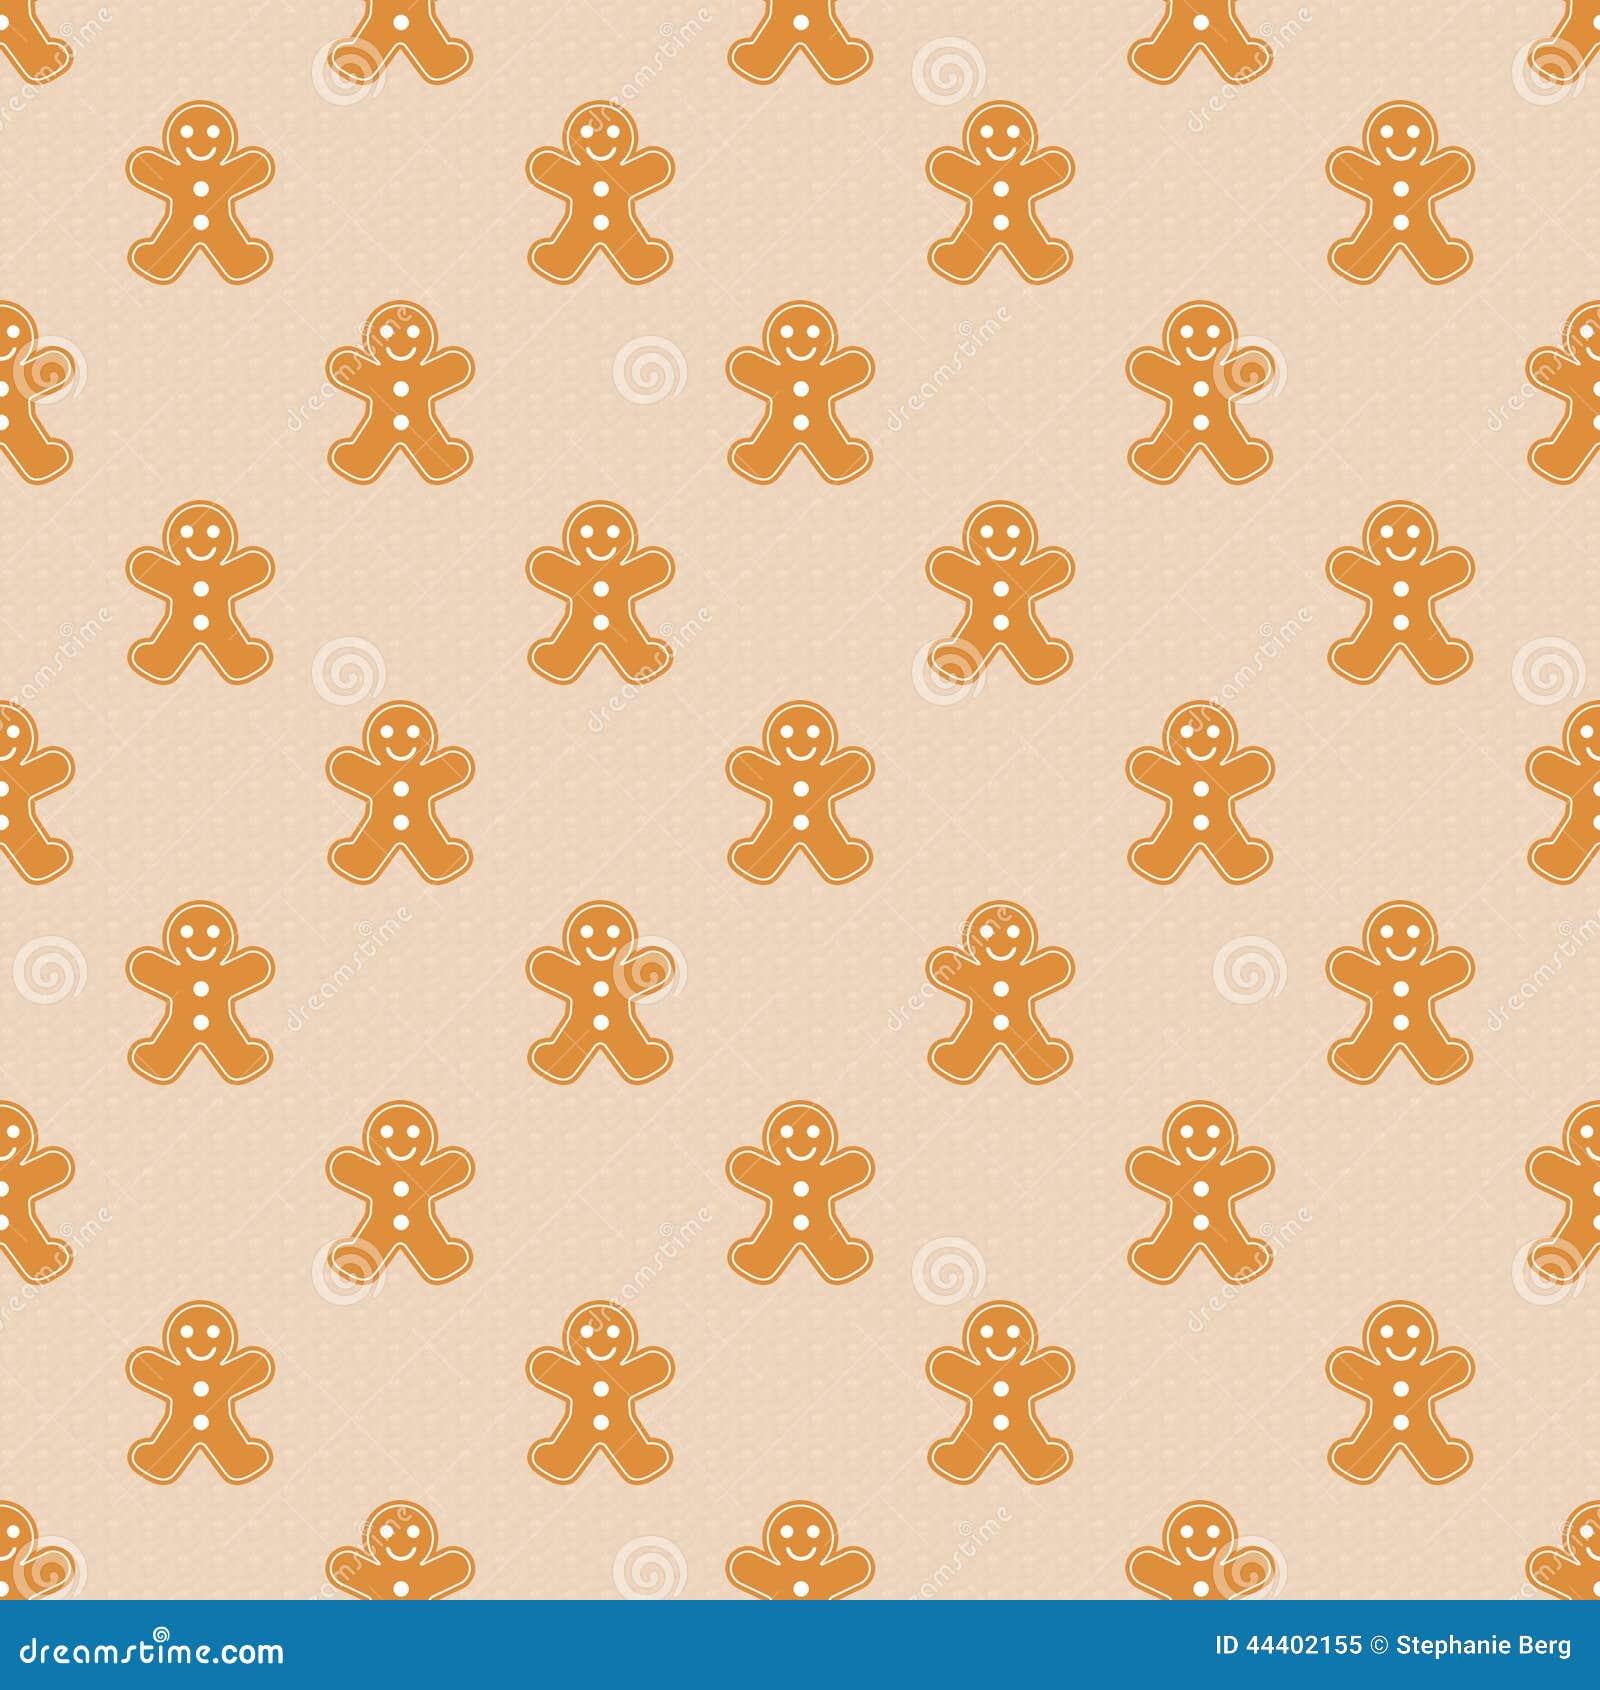 Gingerbread Men Wallpaper Stock Illustration Image 44402155